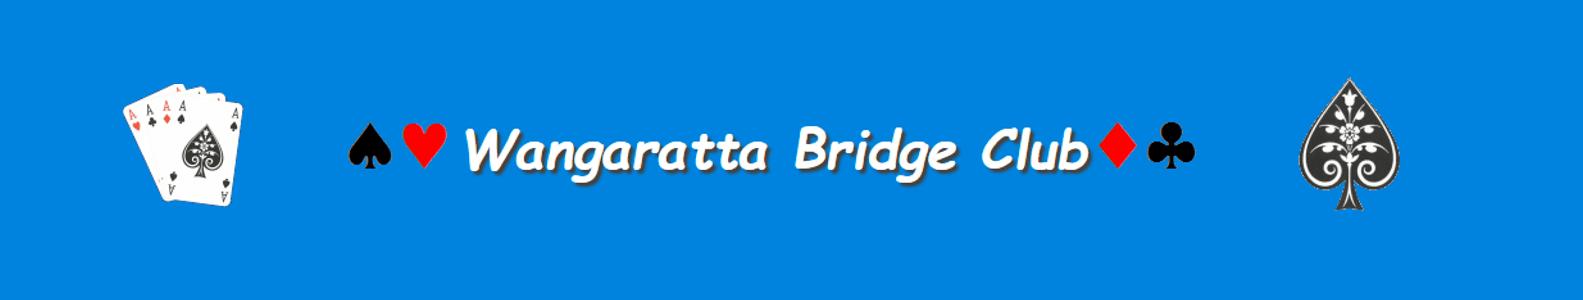 Results from Wangaratta games